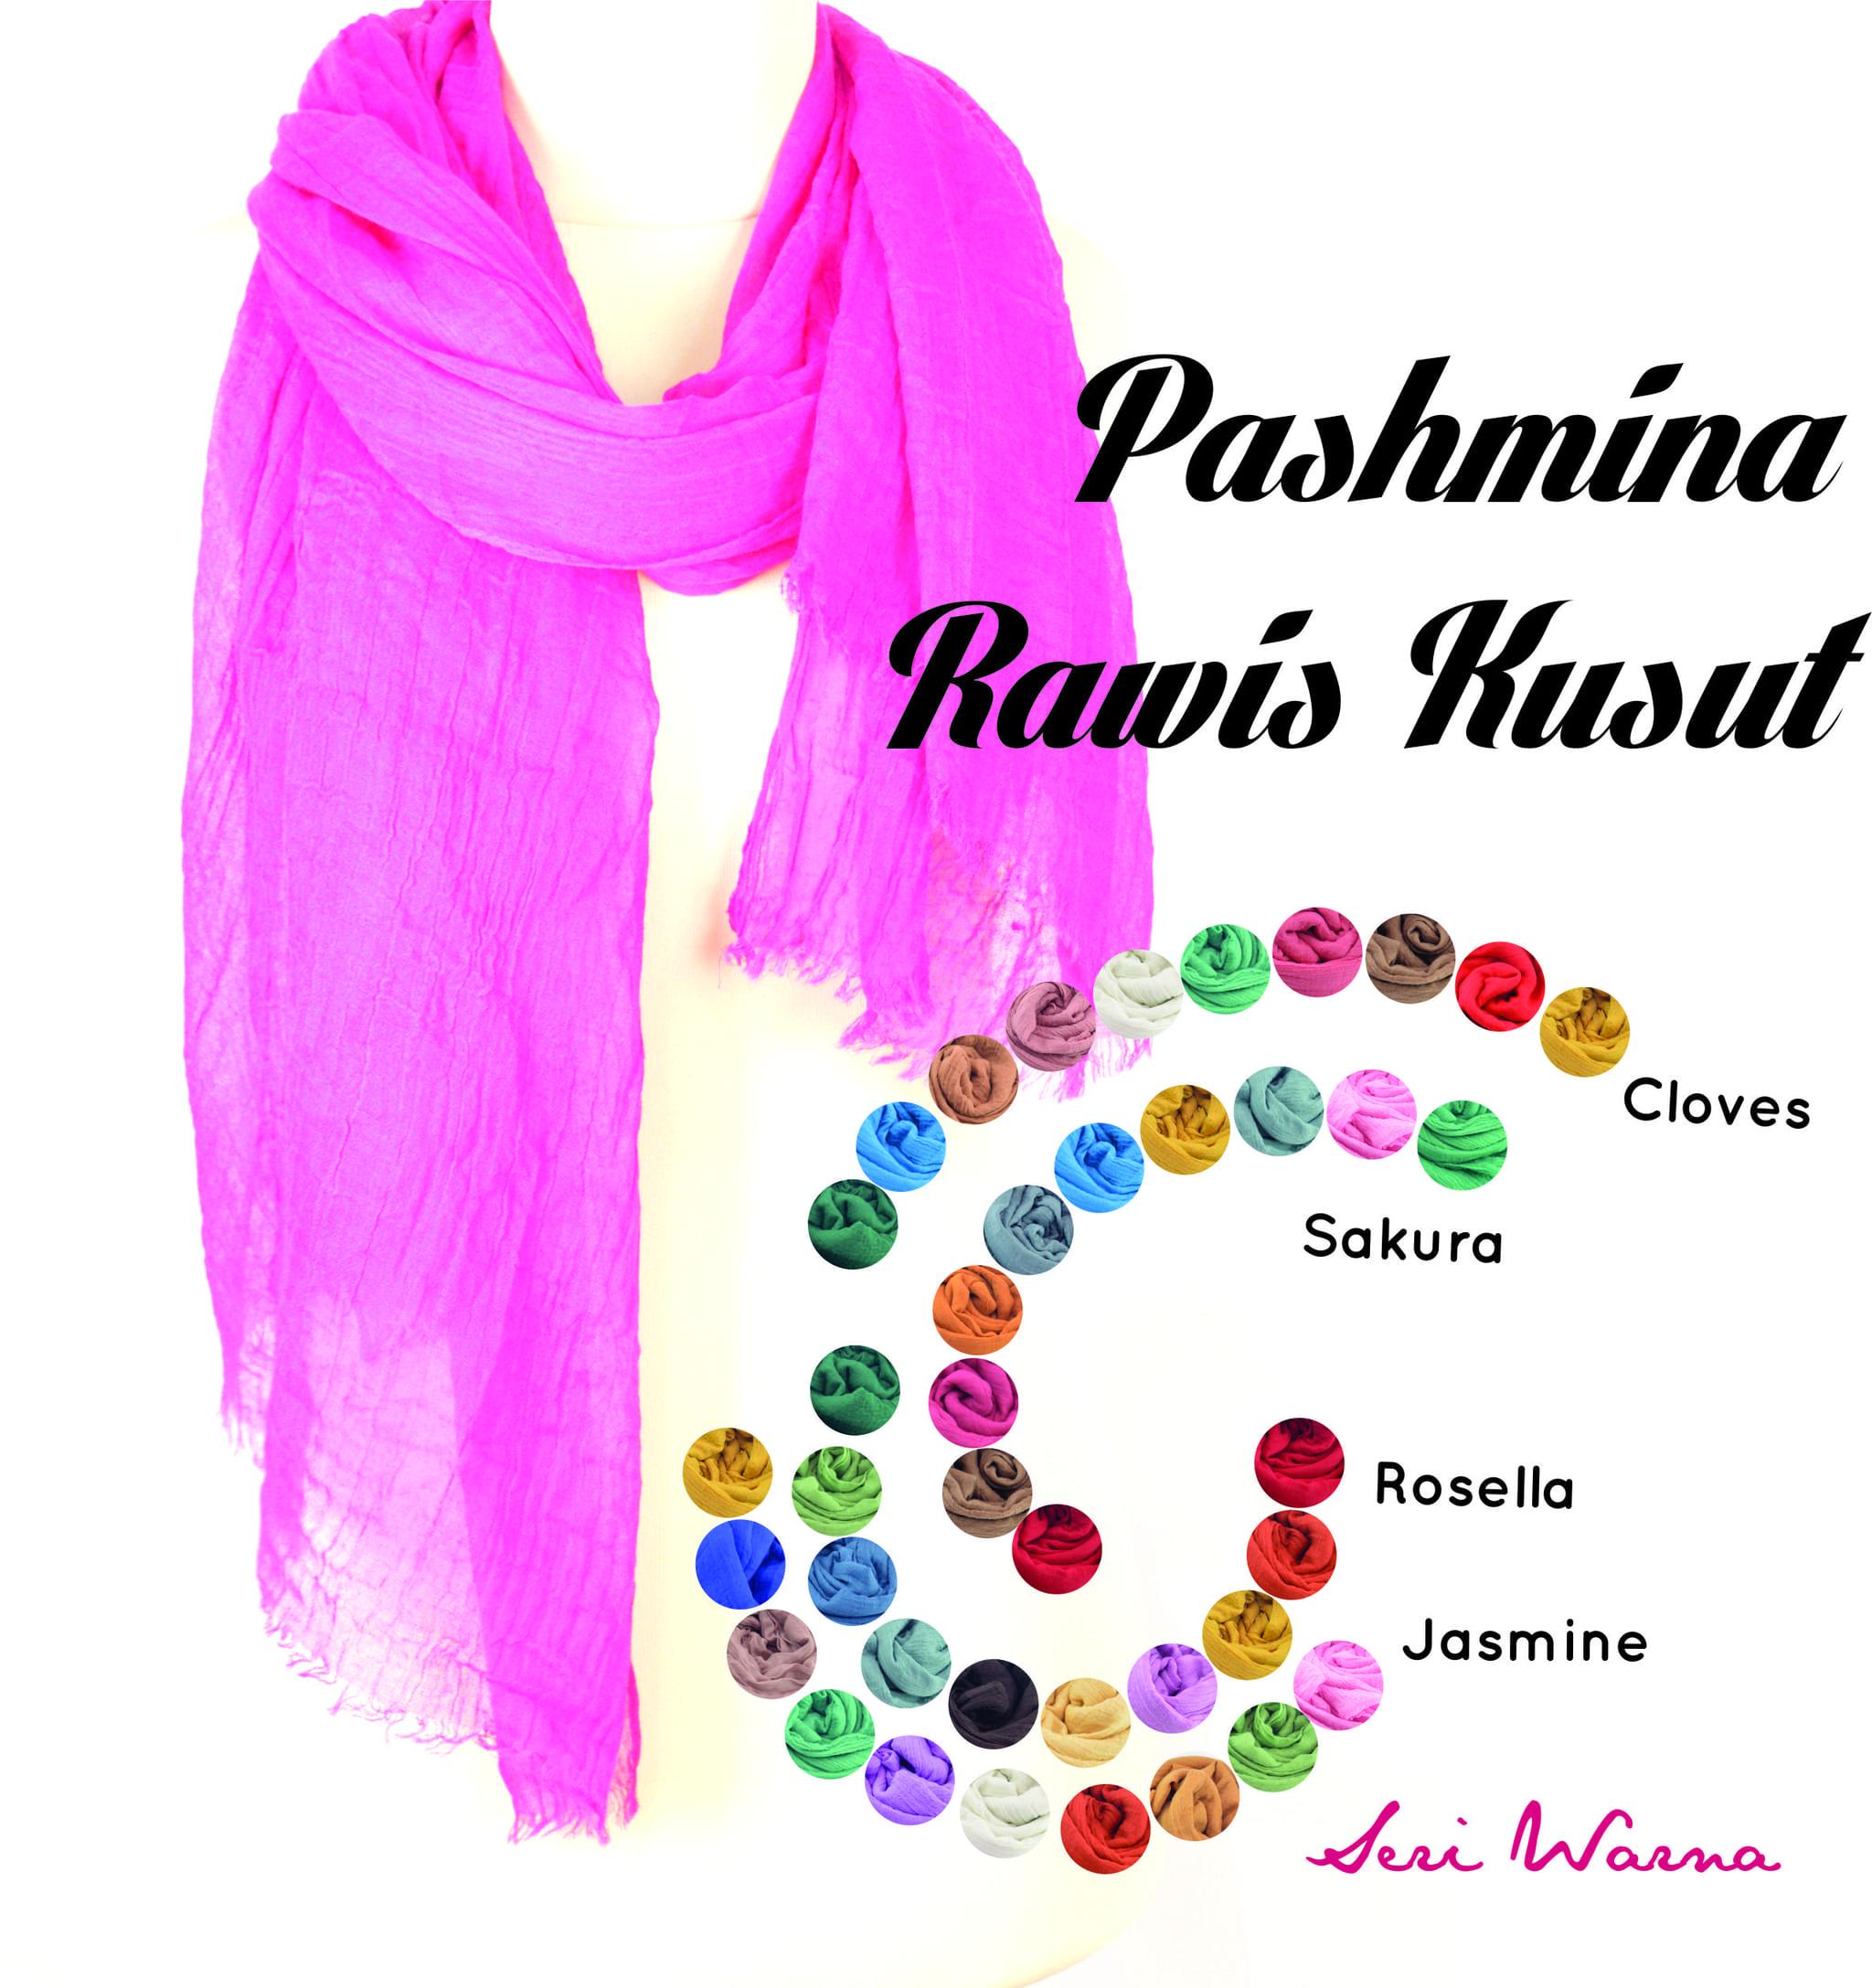 JILBAB | HIJAB | KERUDUNG | PASHMINA | PASHMINA RAWIS KUSUT